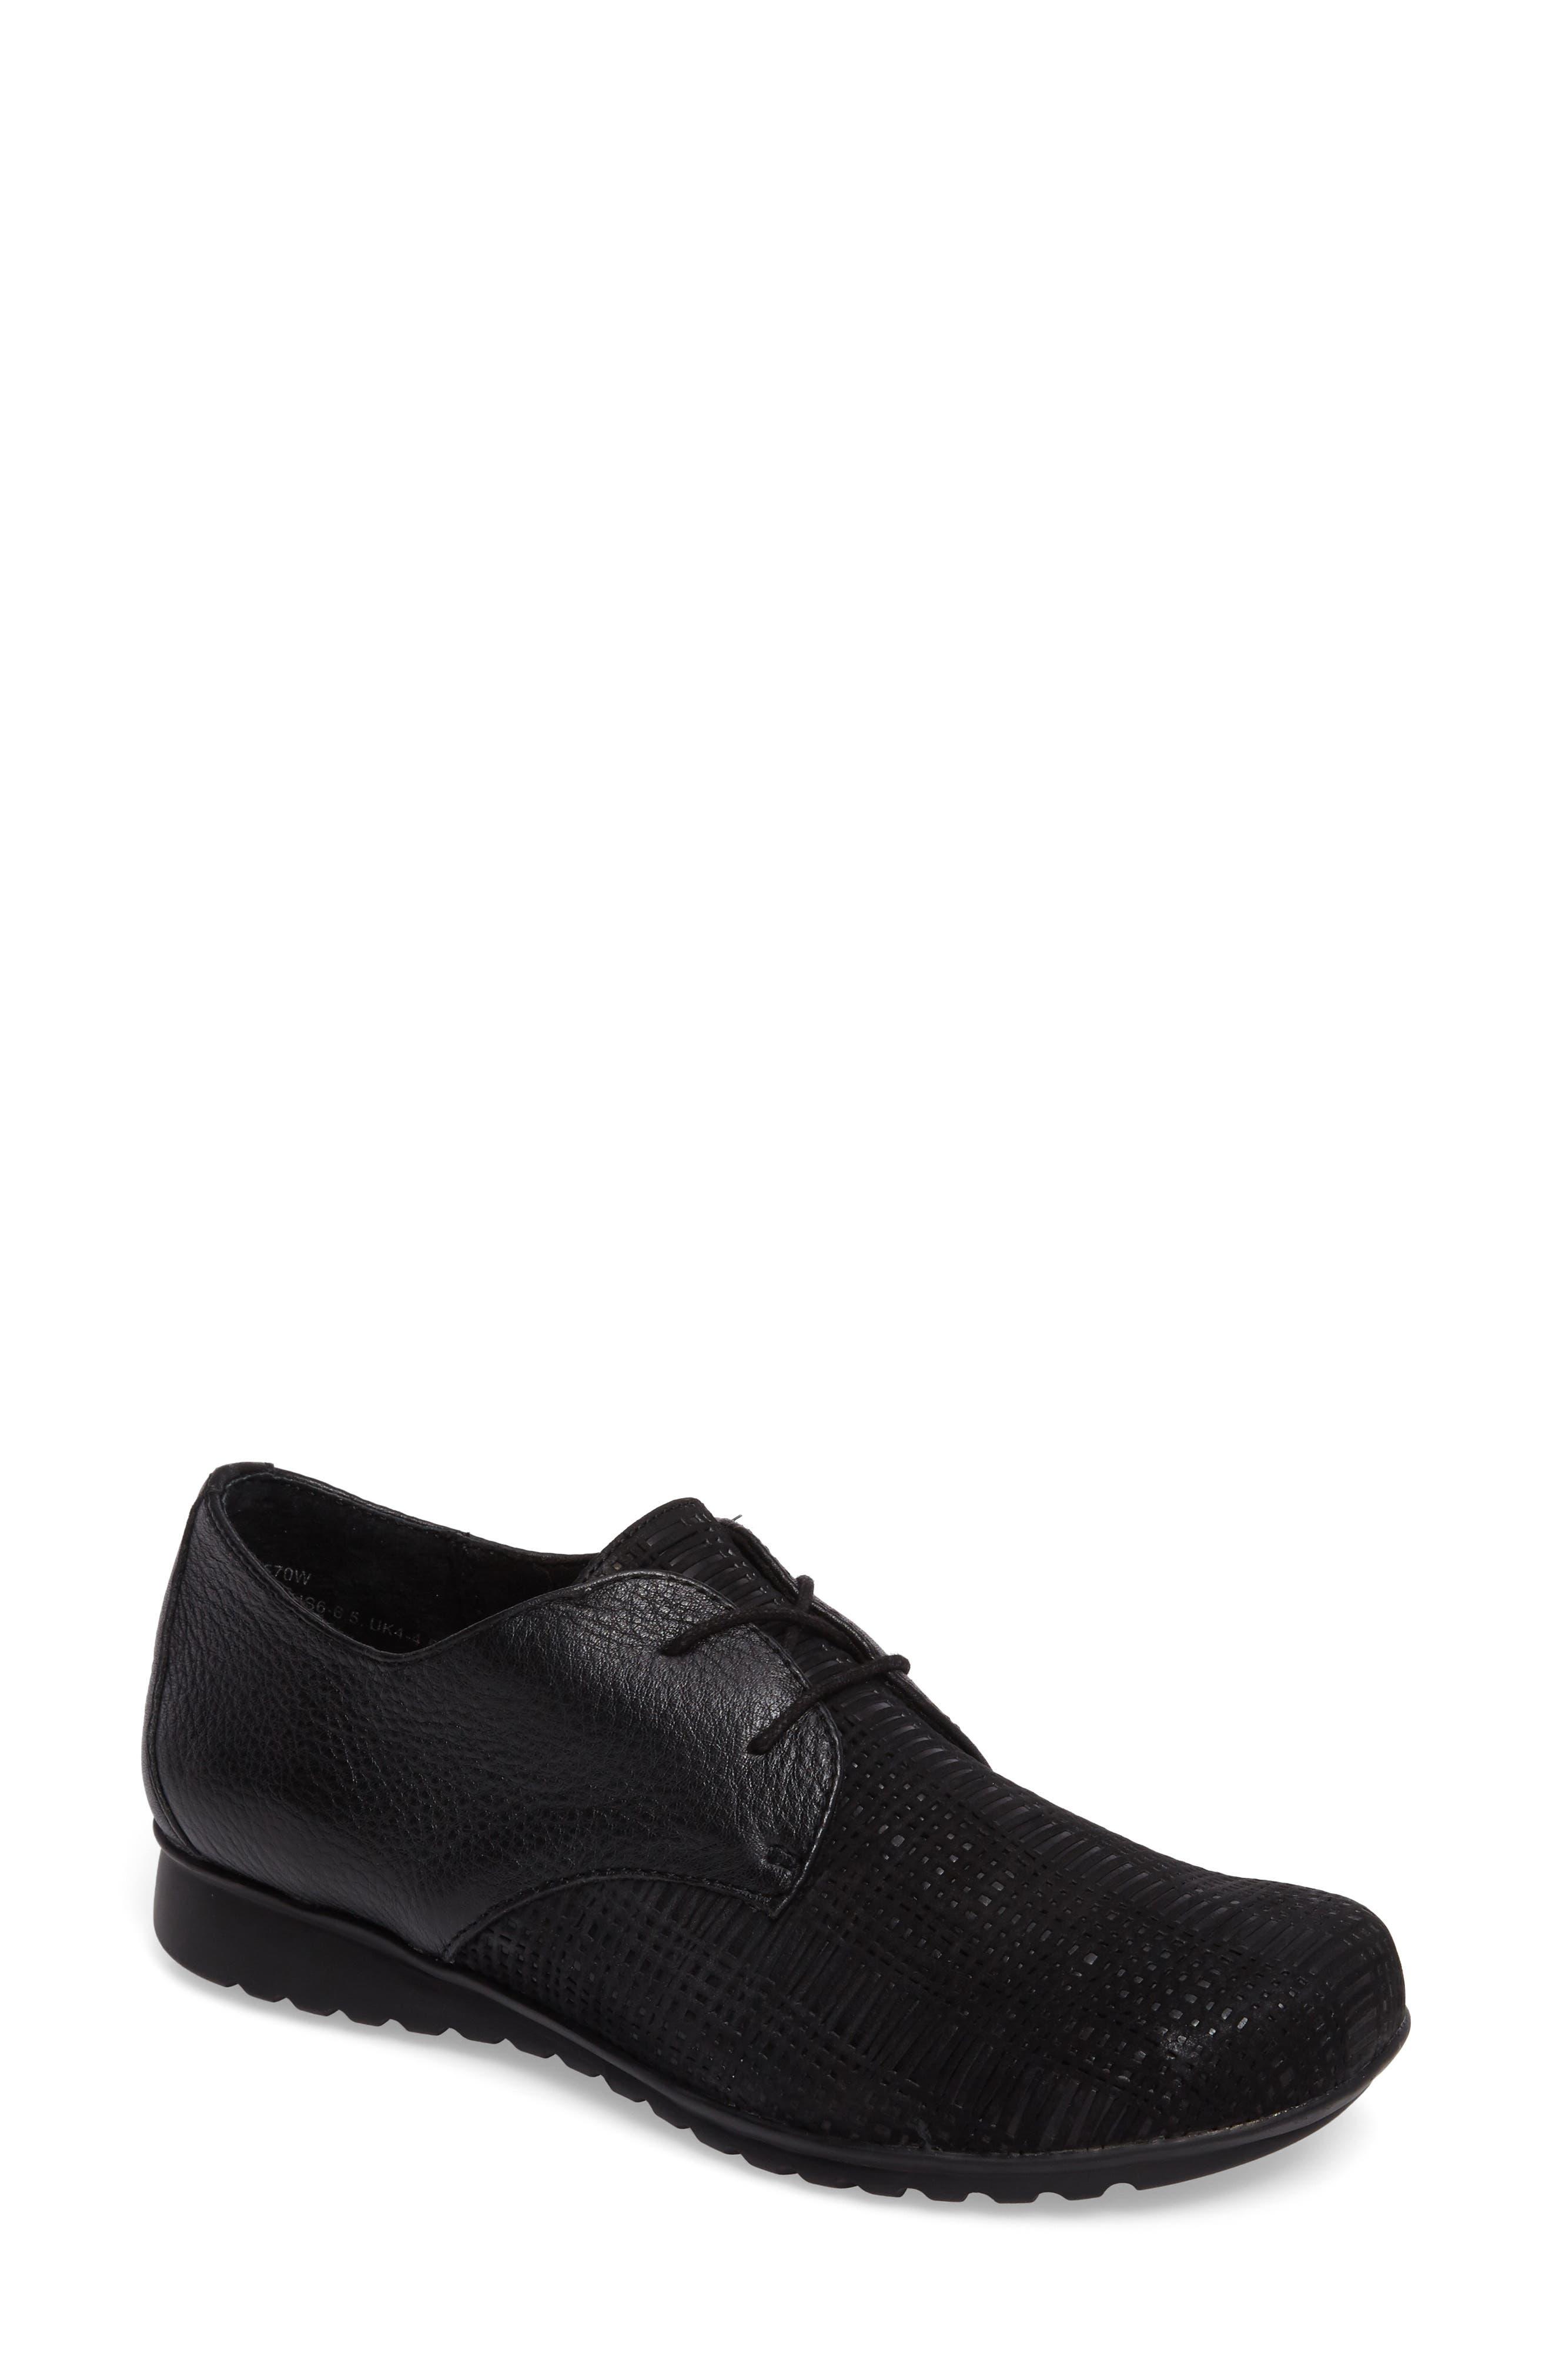 Alternate Image 1 Selected - Aetrex Erin Saddle Shoe (Women)